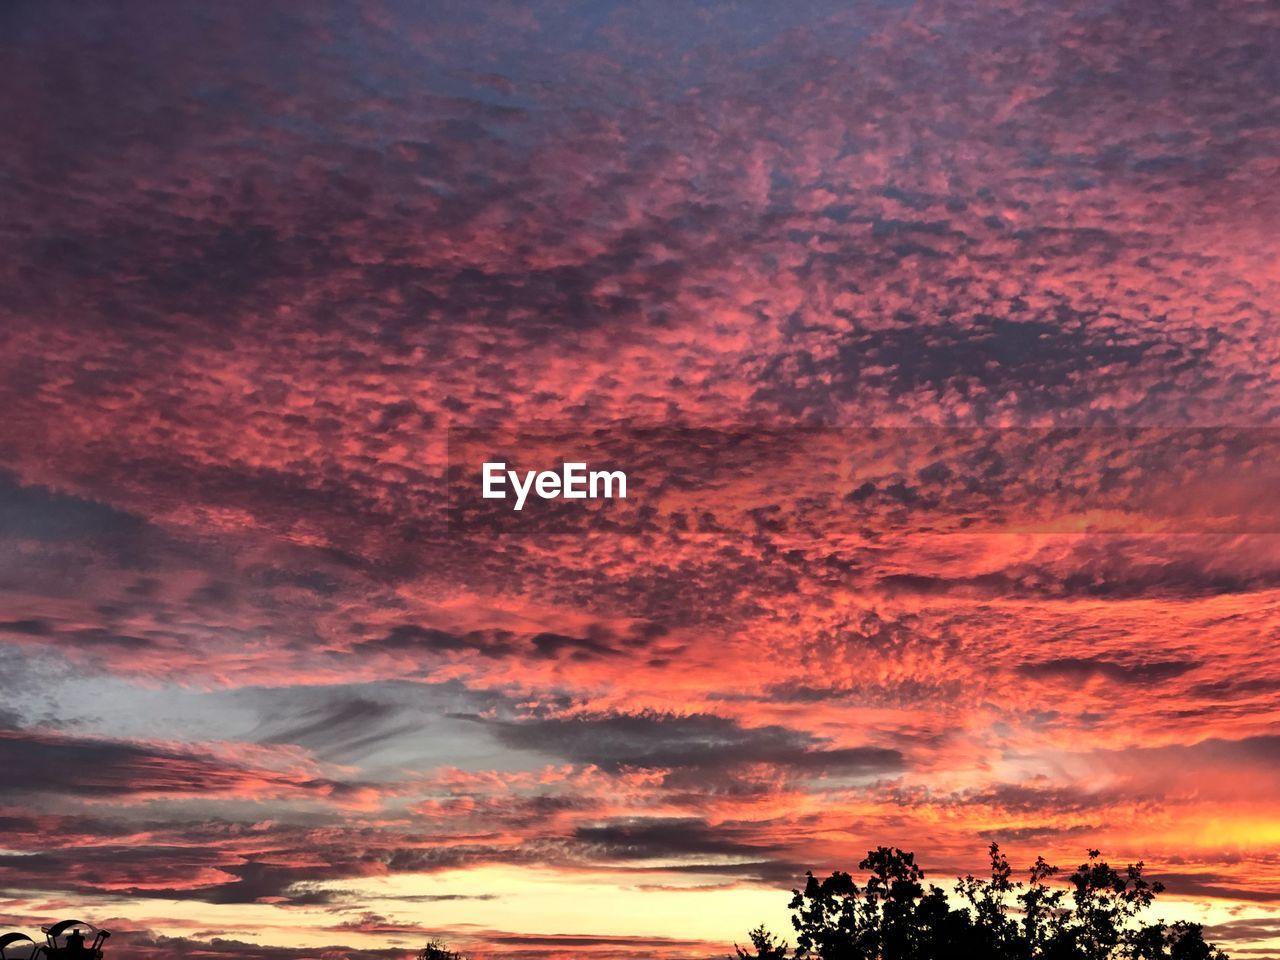 sky, cloud - sky, sunset, beauty in nature, scenics - nature, tree, tranquility, tranquil scene, nature, plant, no people, orange color, idyllic, dramatic sky, silhouette, low angle view, cloudscape, outdoors, non-urban scene, purple, romantic sky